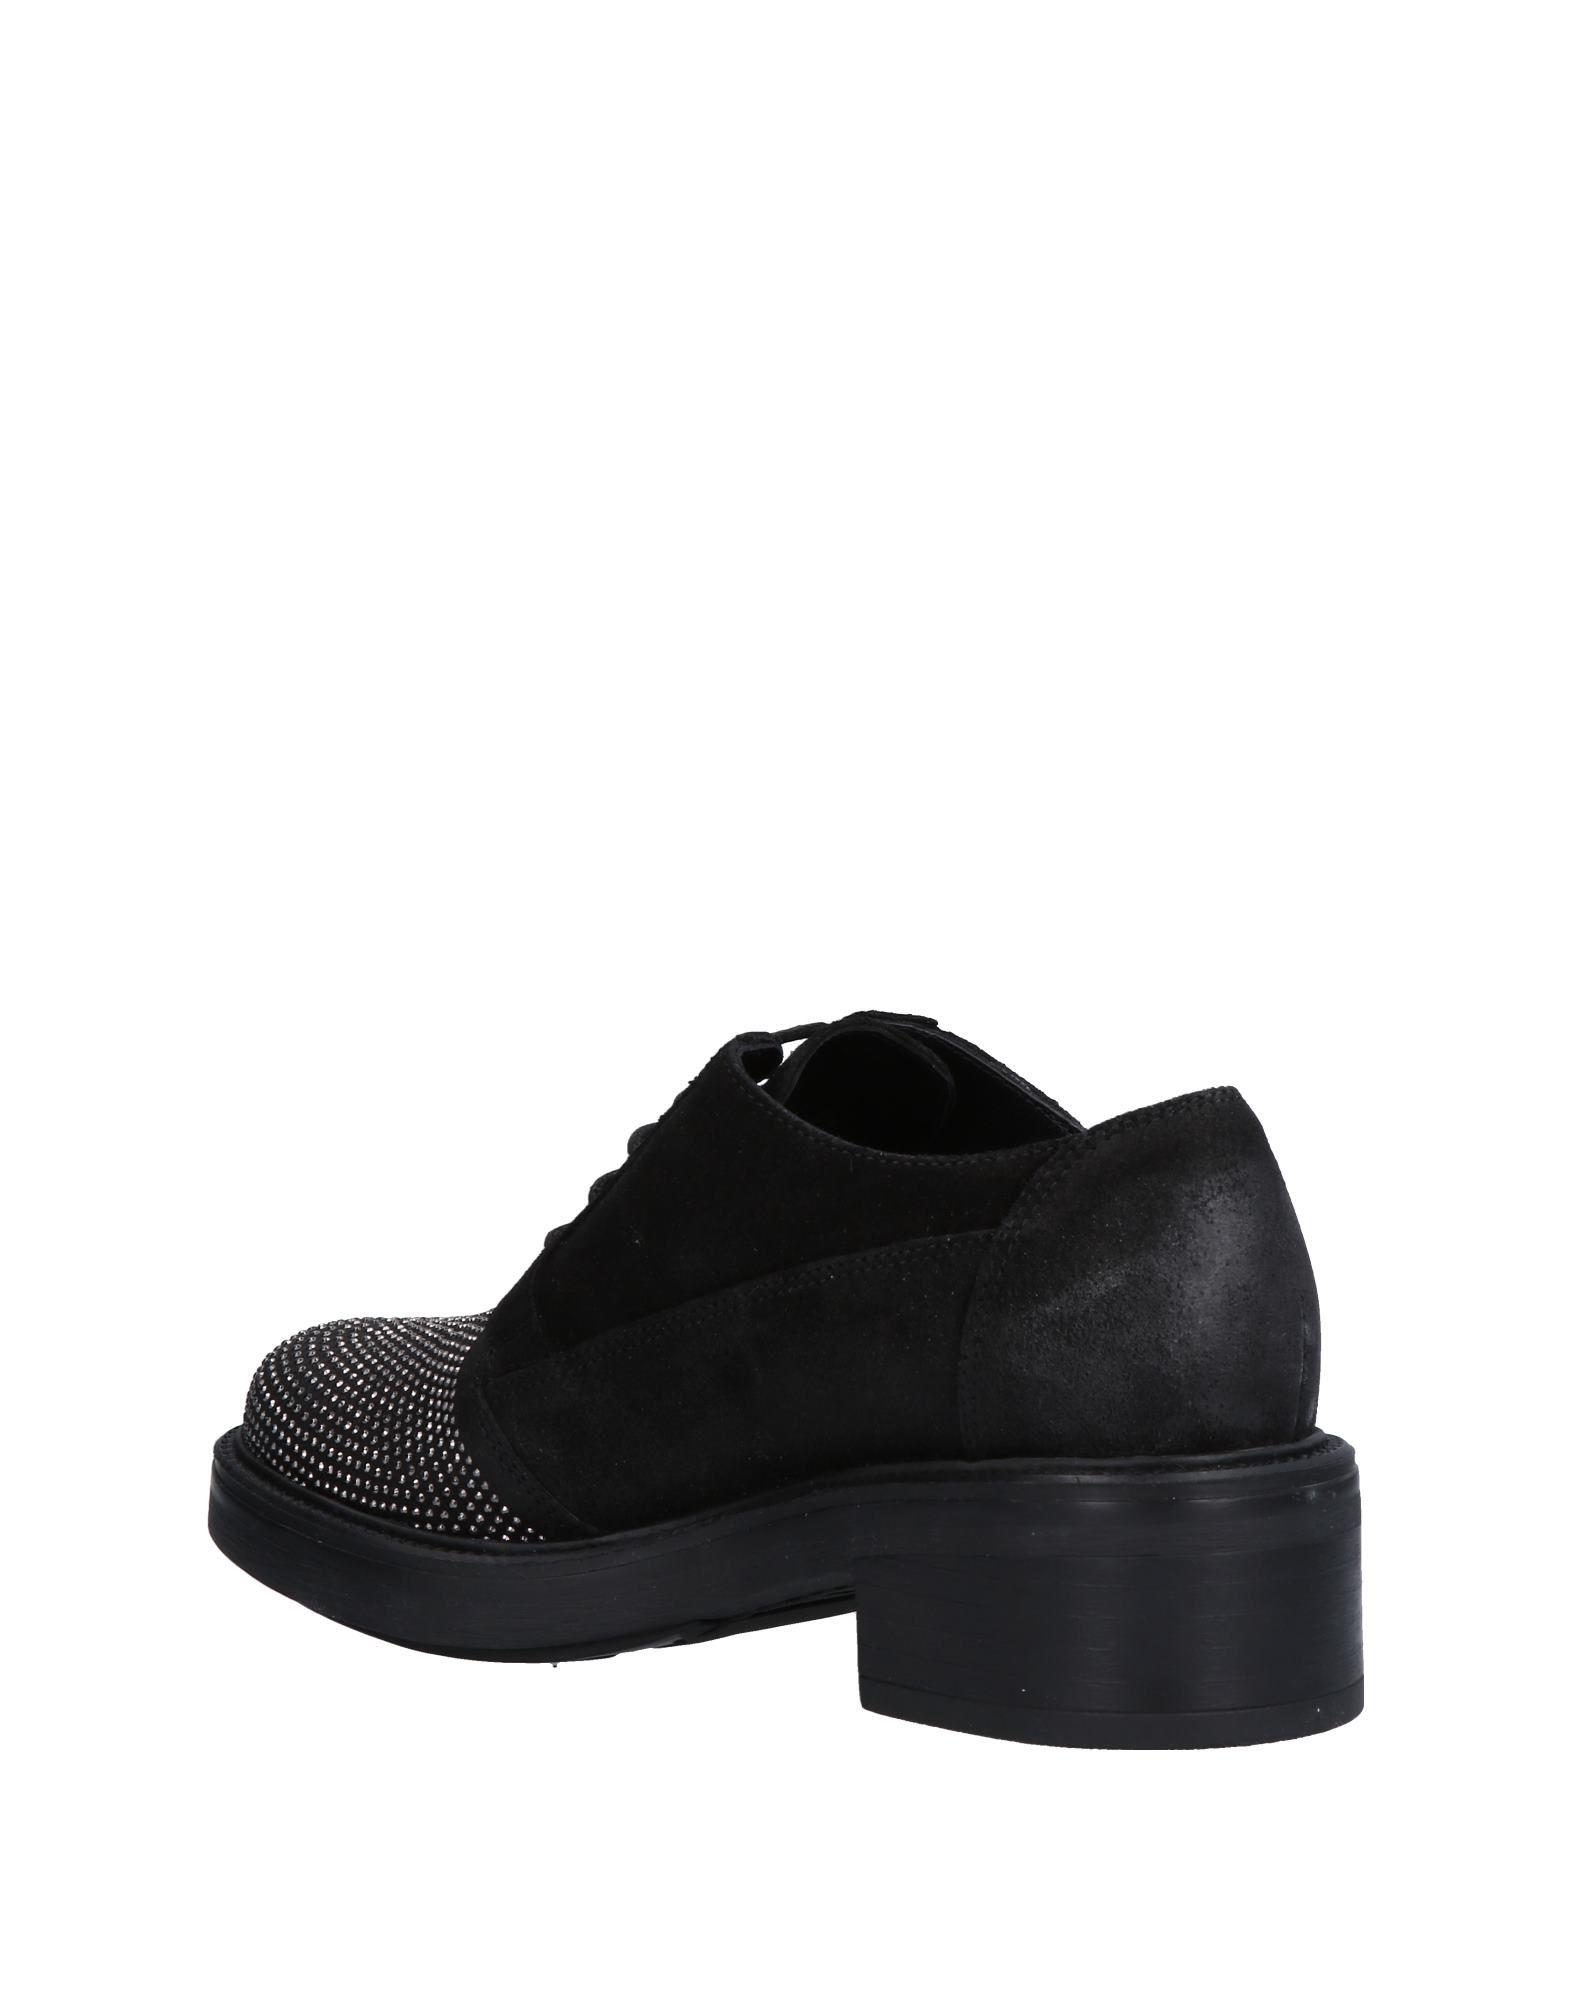 CHAUSSURES - Chaussures à lacetsJFK 3rWcN4T